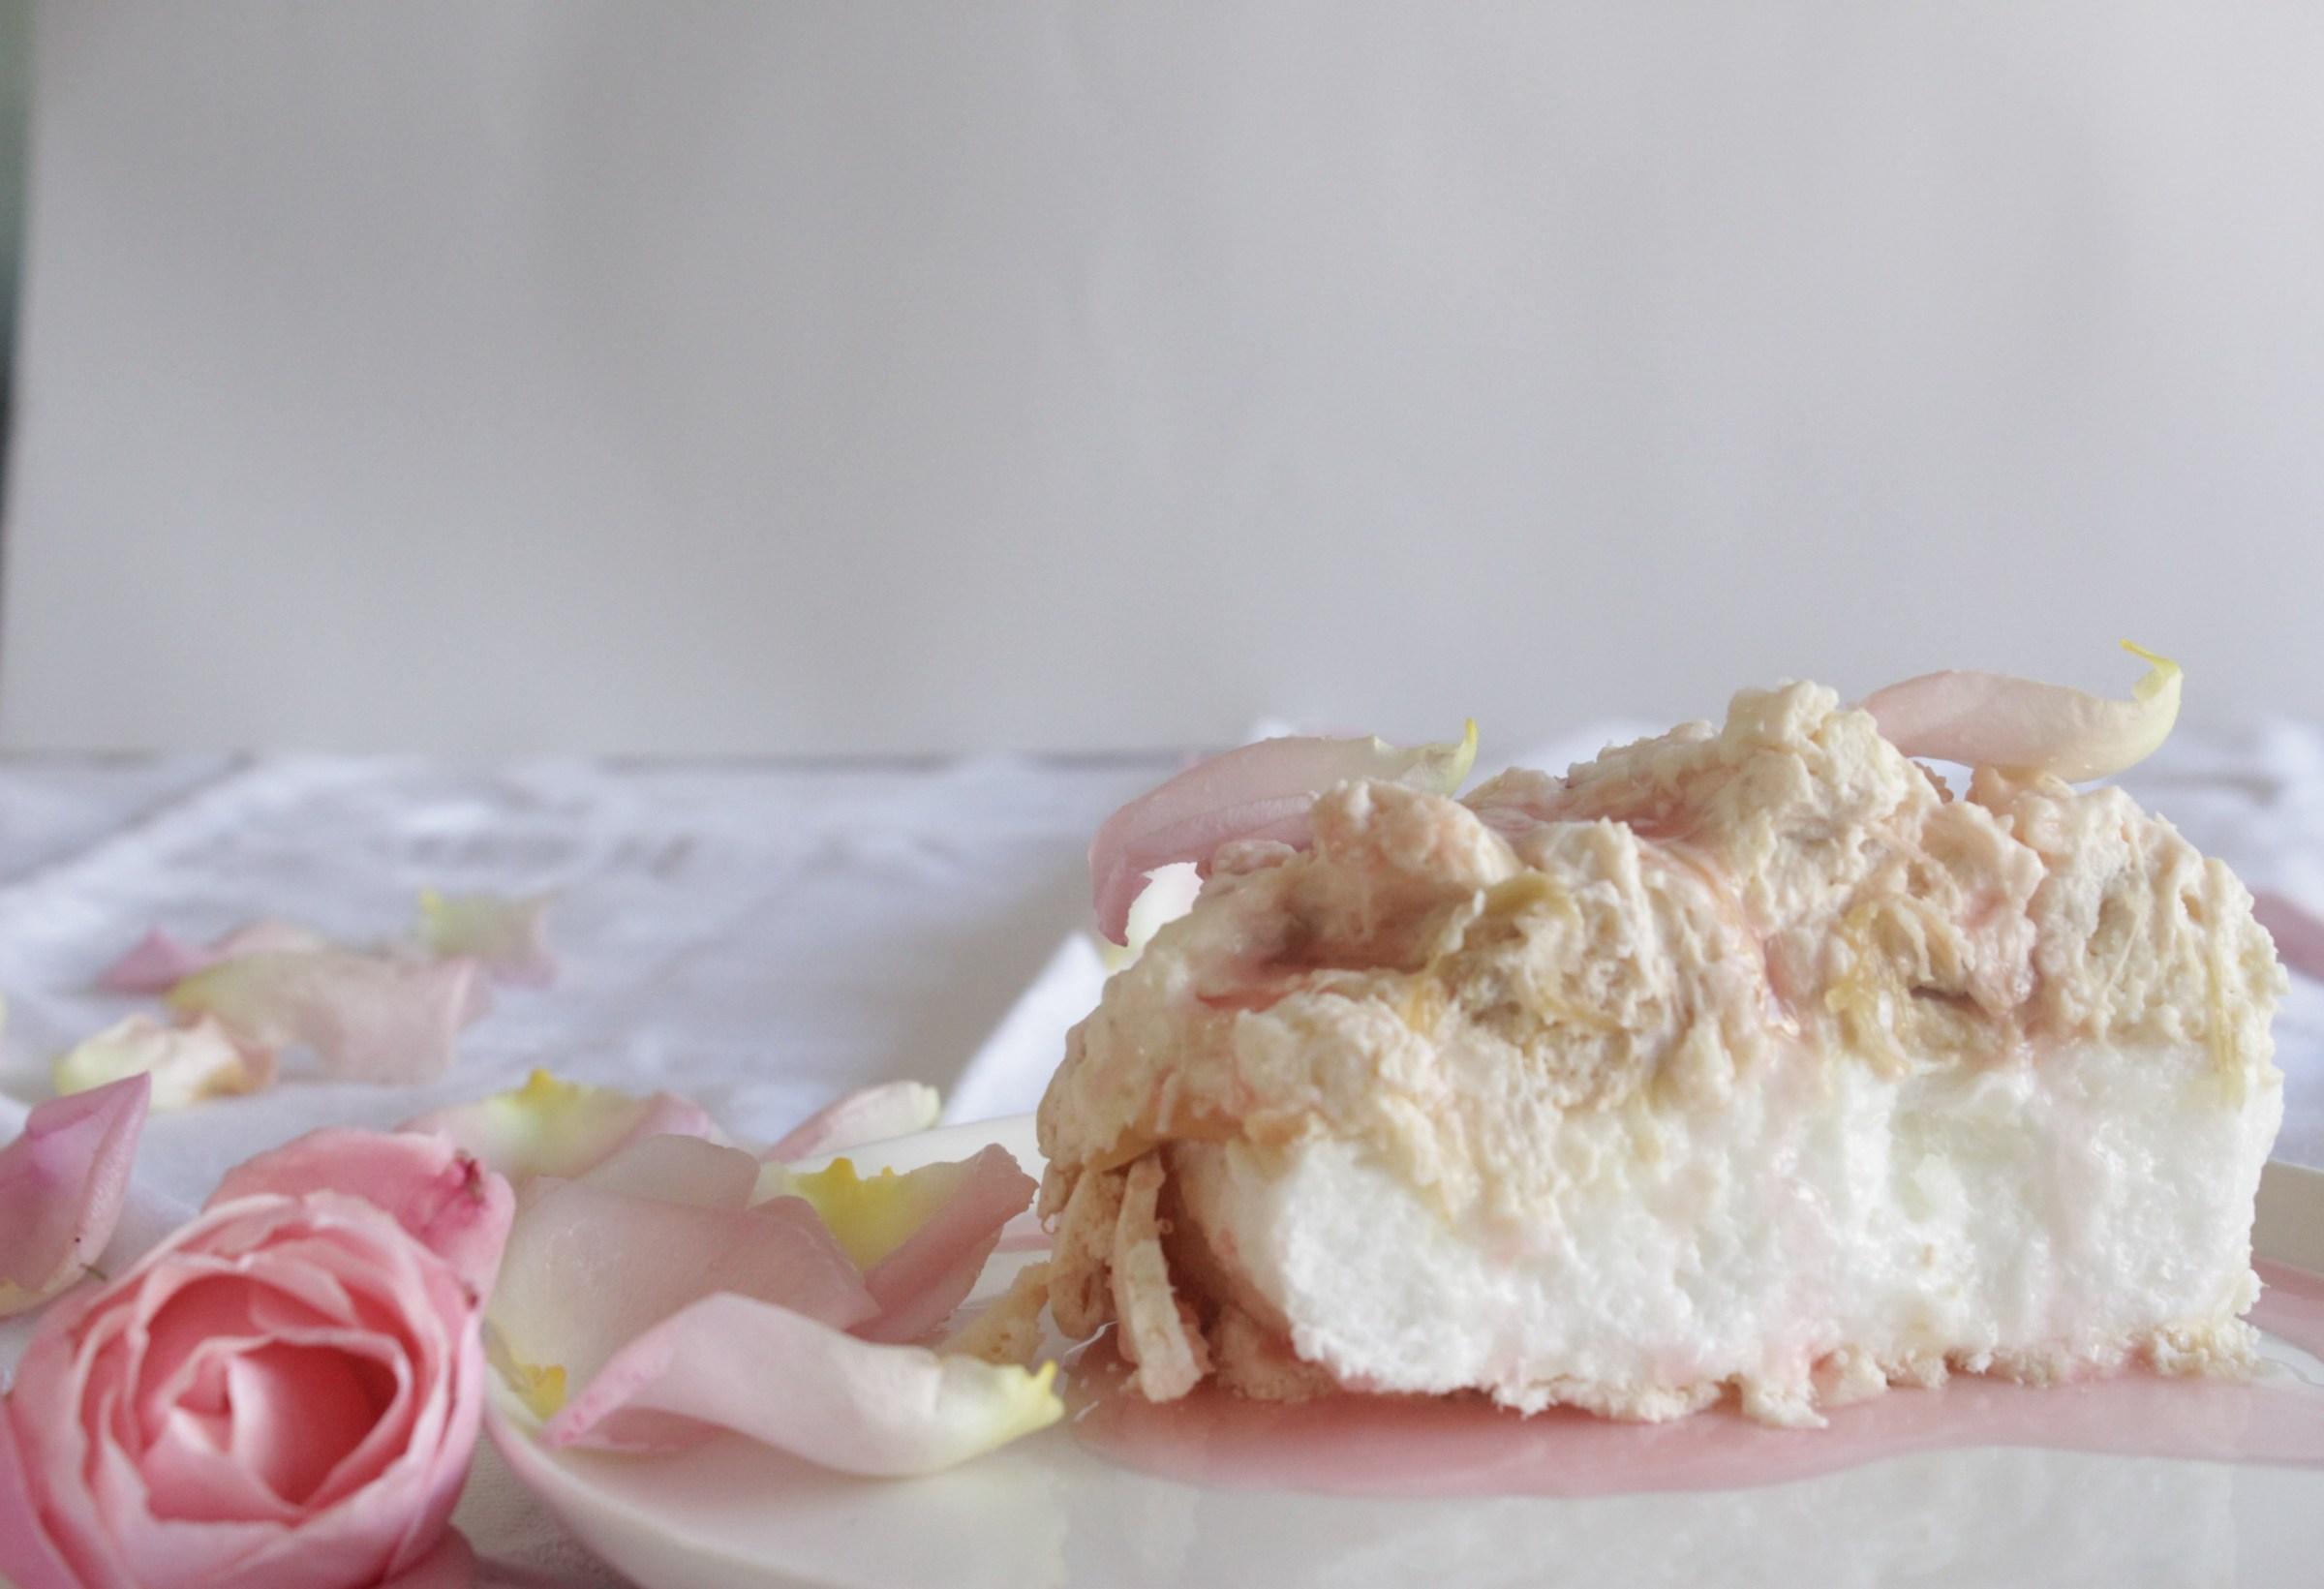 Rhubarb, rose water & white chocolate pavlova